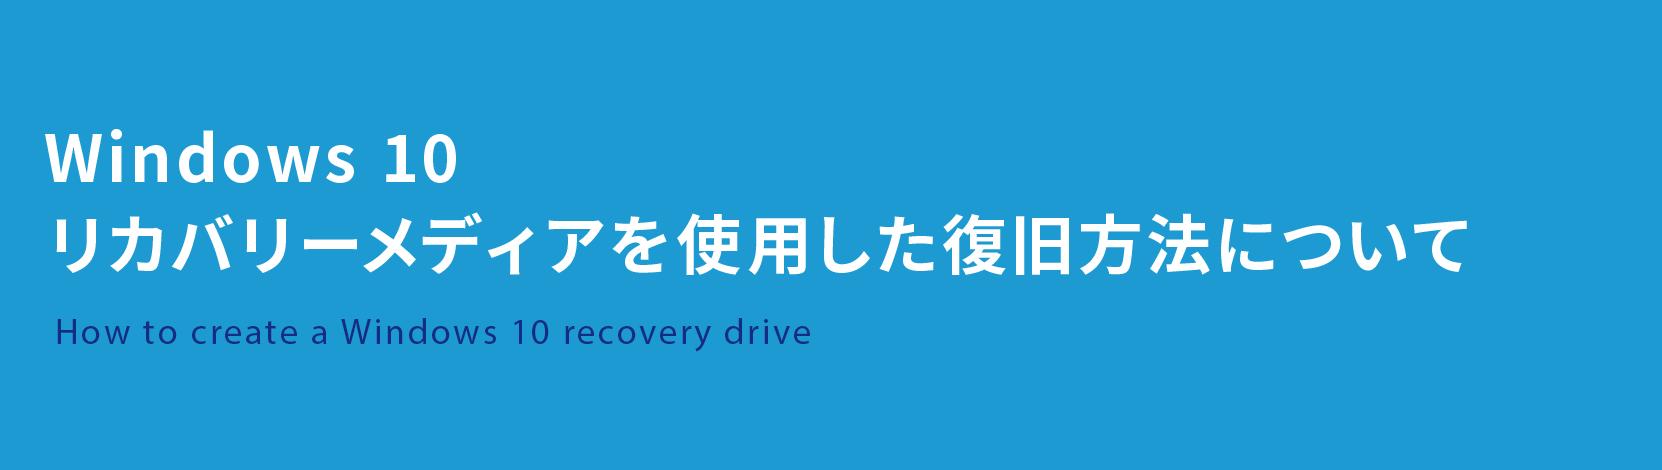 Windows 10 リカバリーメディアを使用した復旧方法について How to create a Windows 10 recovery drive